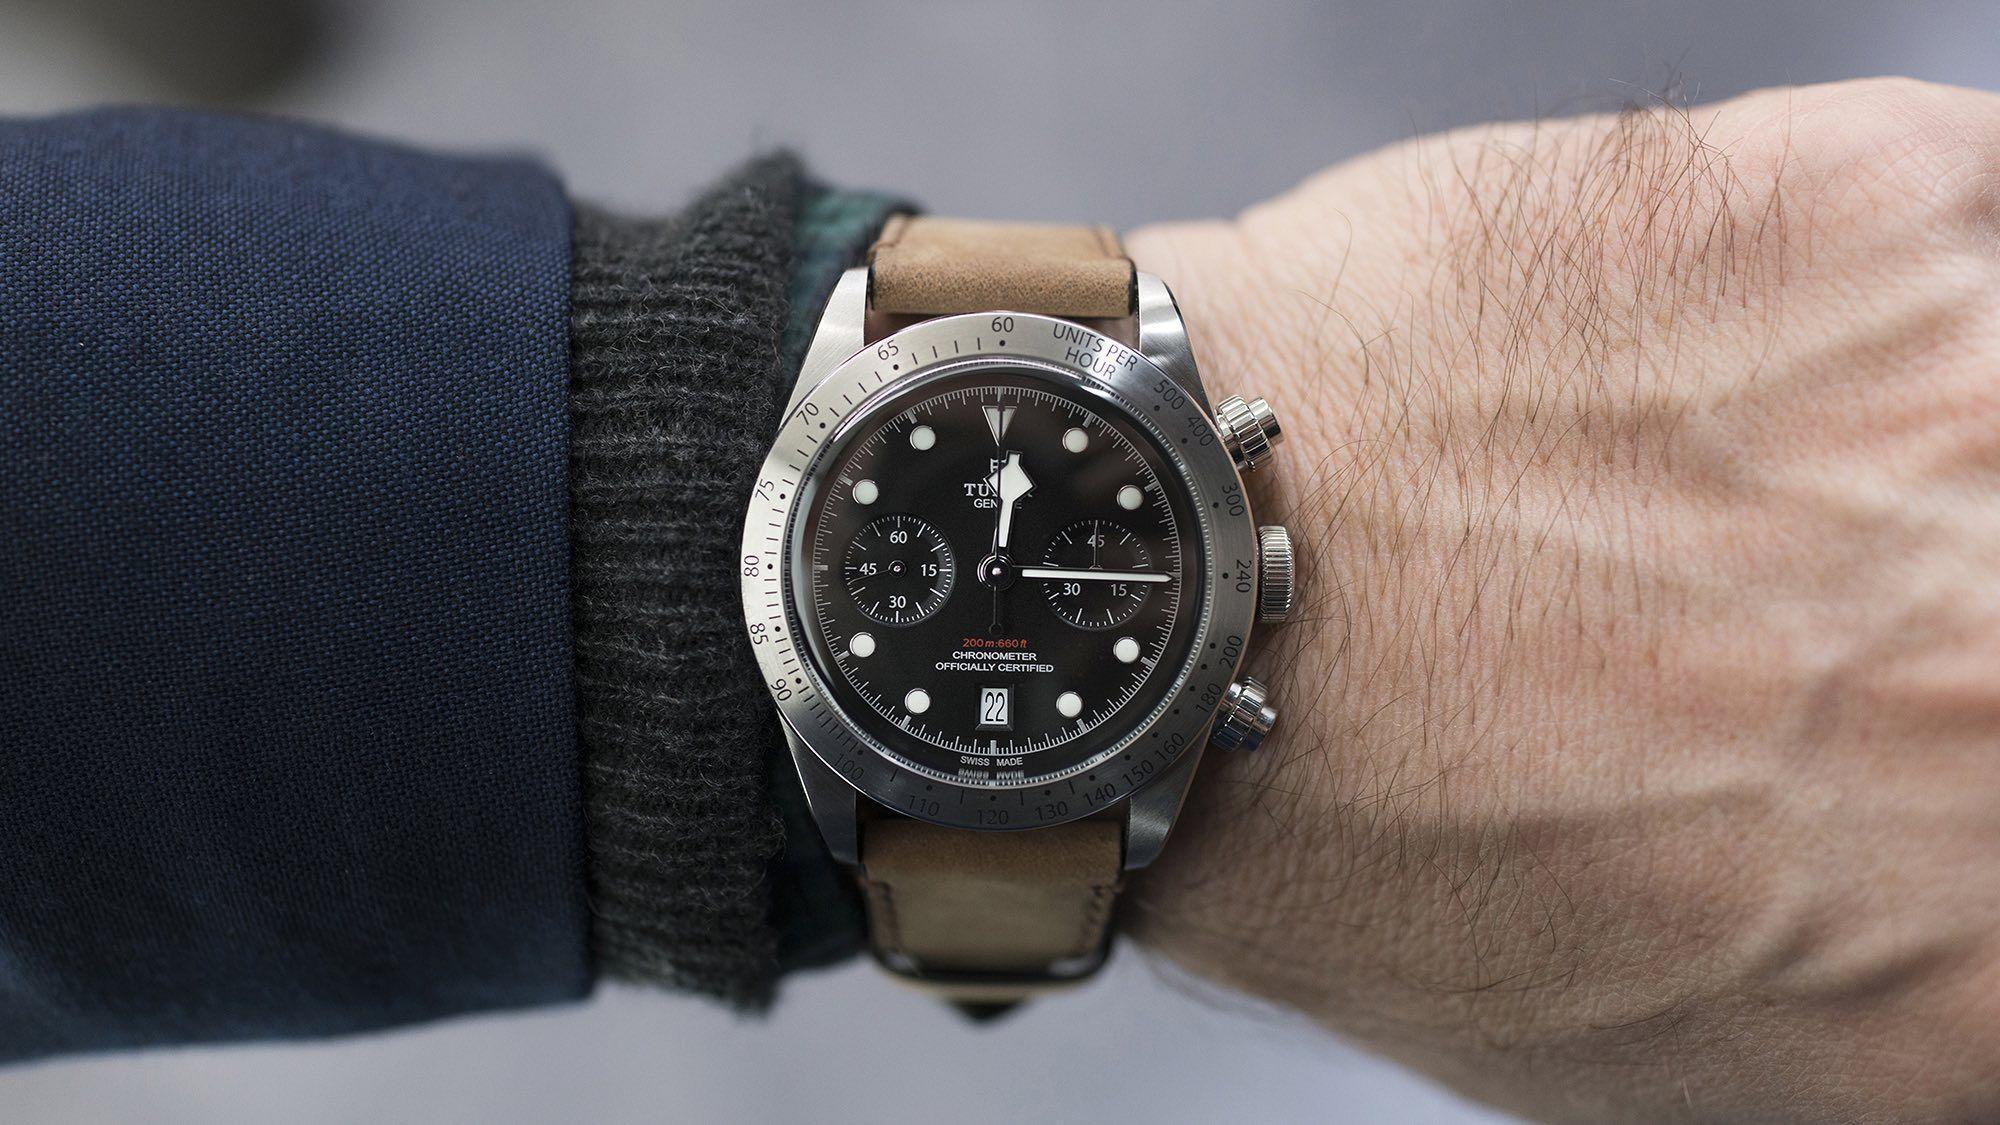 Happenings Join Hodinkee And Tudor In Celebrating The 2017 Baselworld Novelties This Wednesday In Chicago Hodinkee Tudor Black Bay Hodinkee Luxury Timepieces